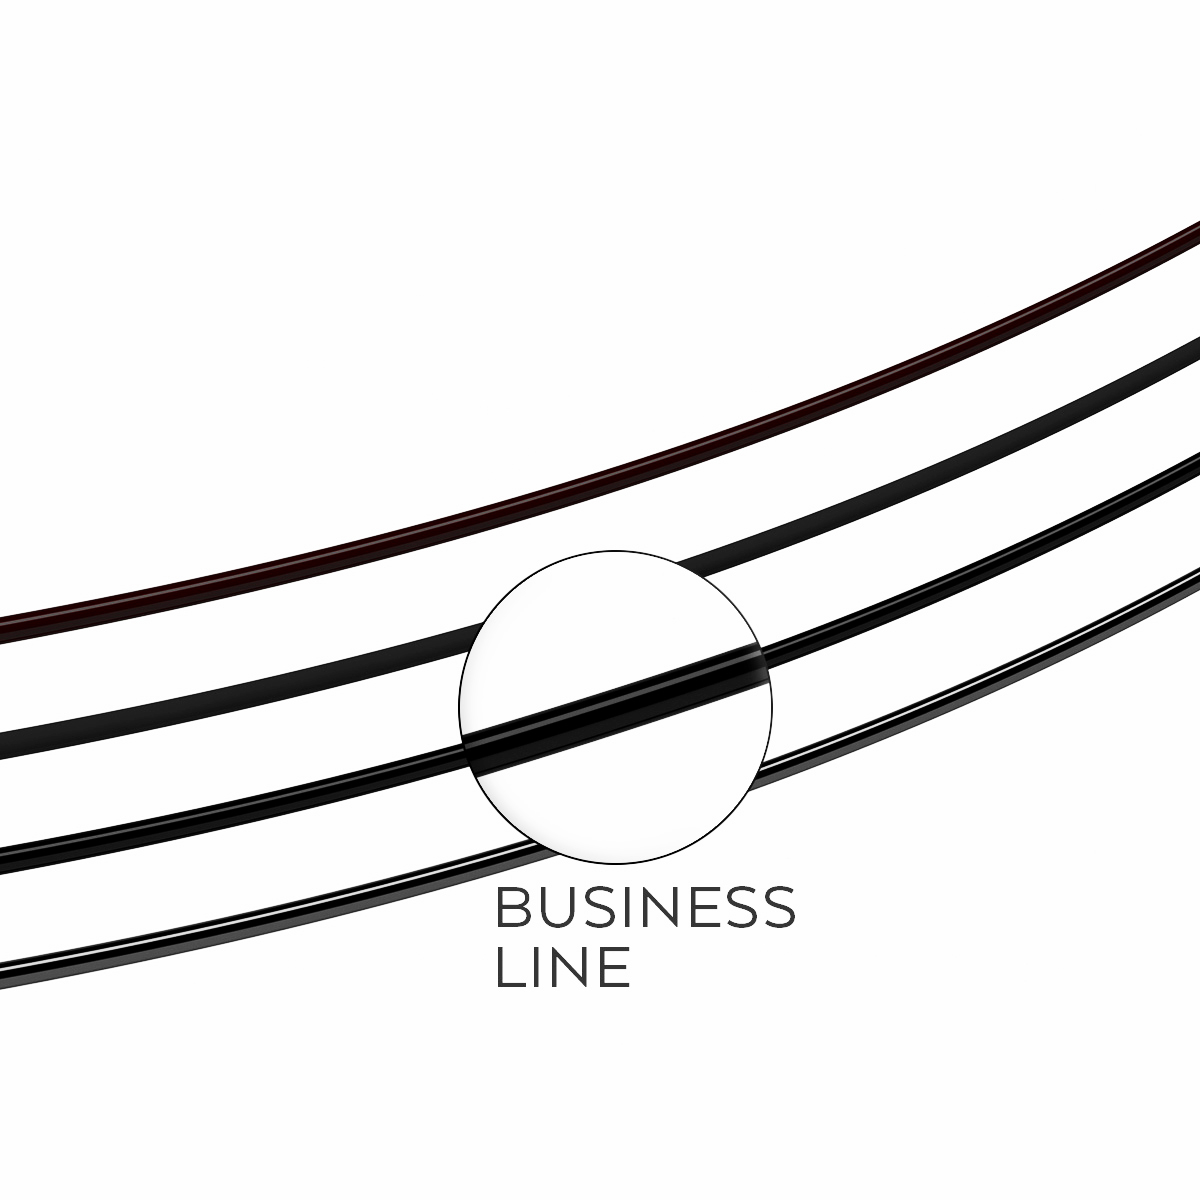 business-line-black-c-0-15